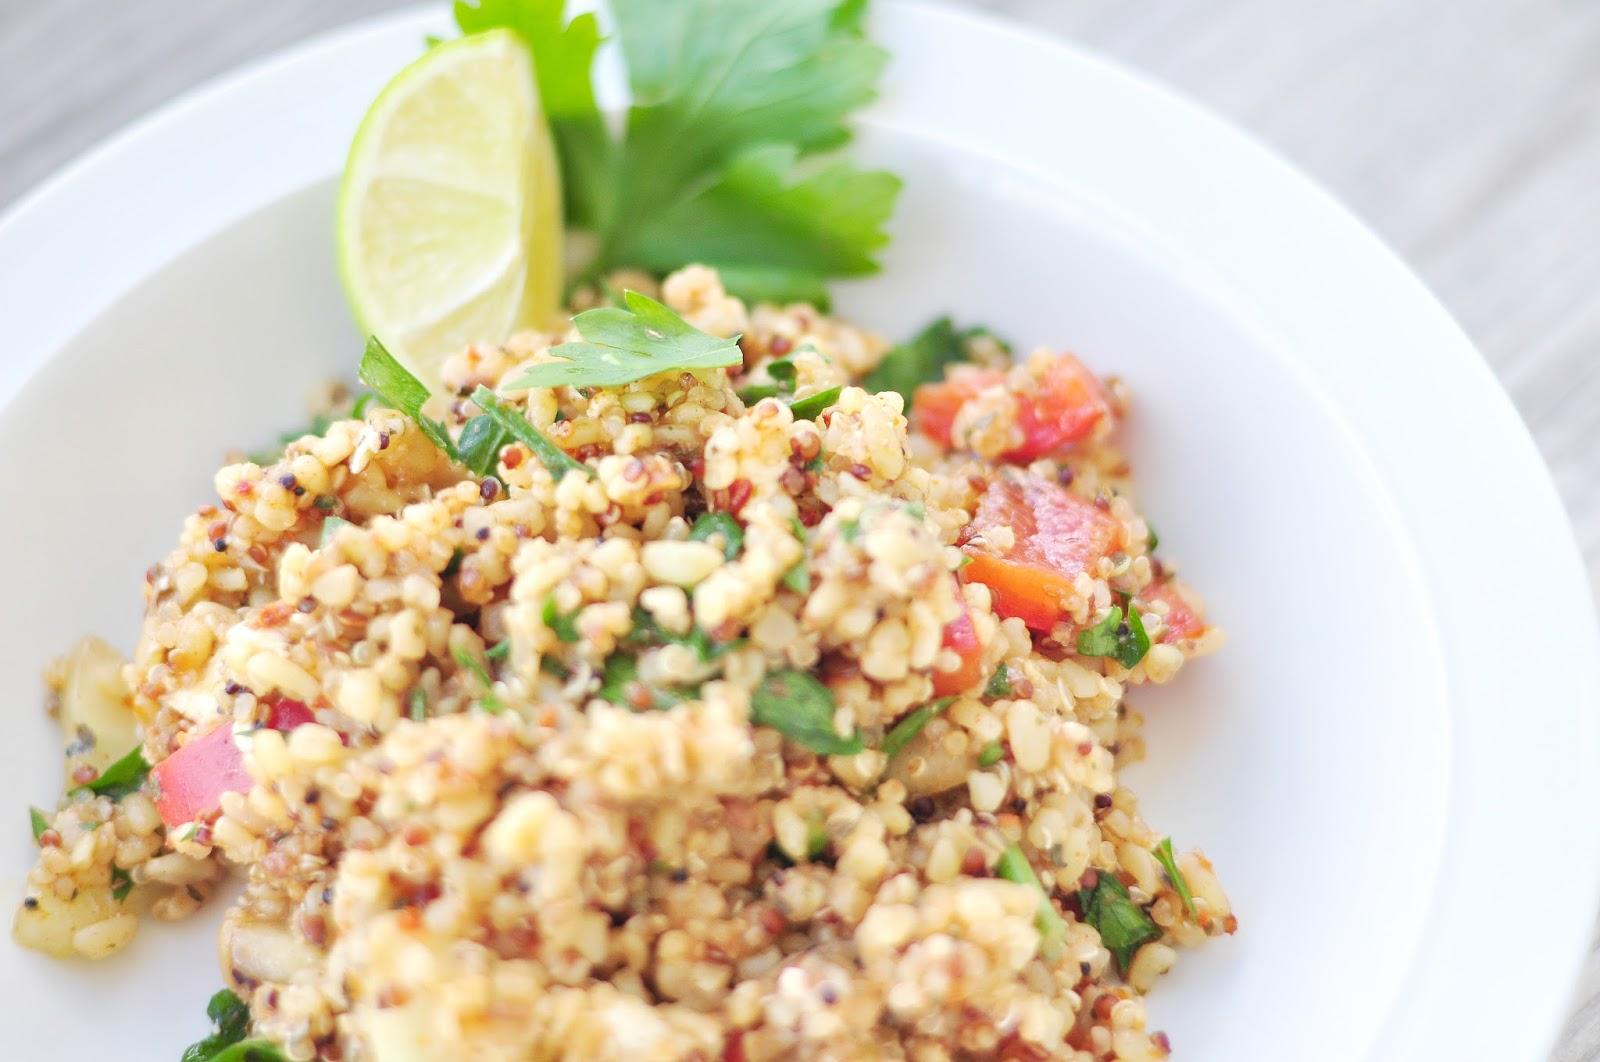 easy favorite salad idea with bulgur and quinoa